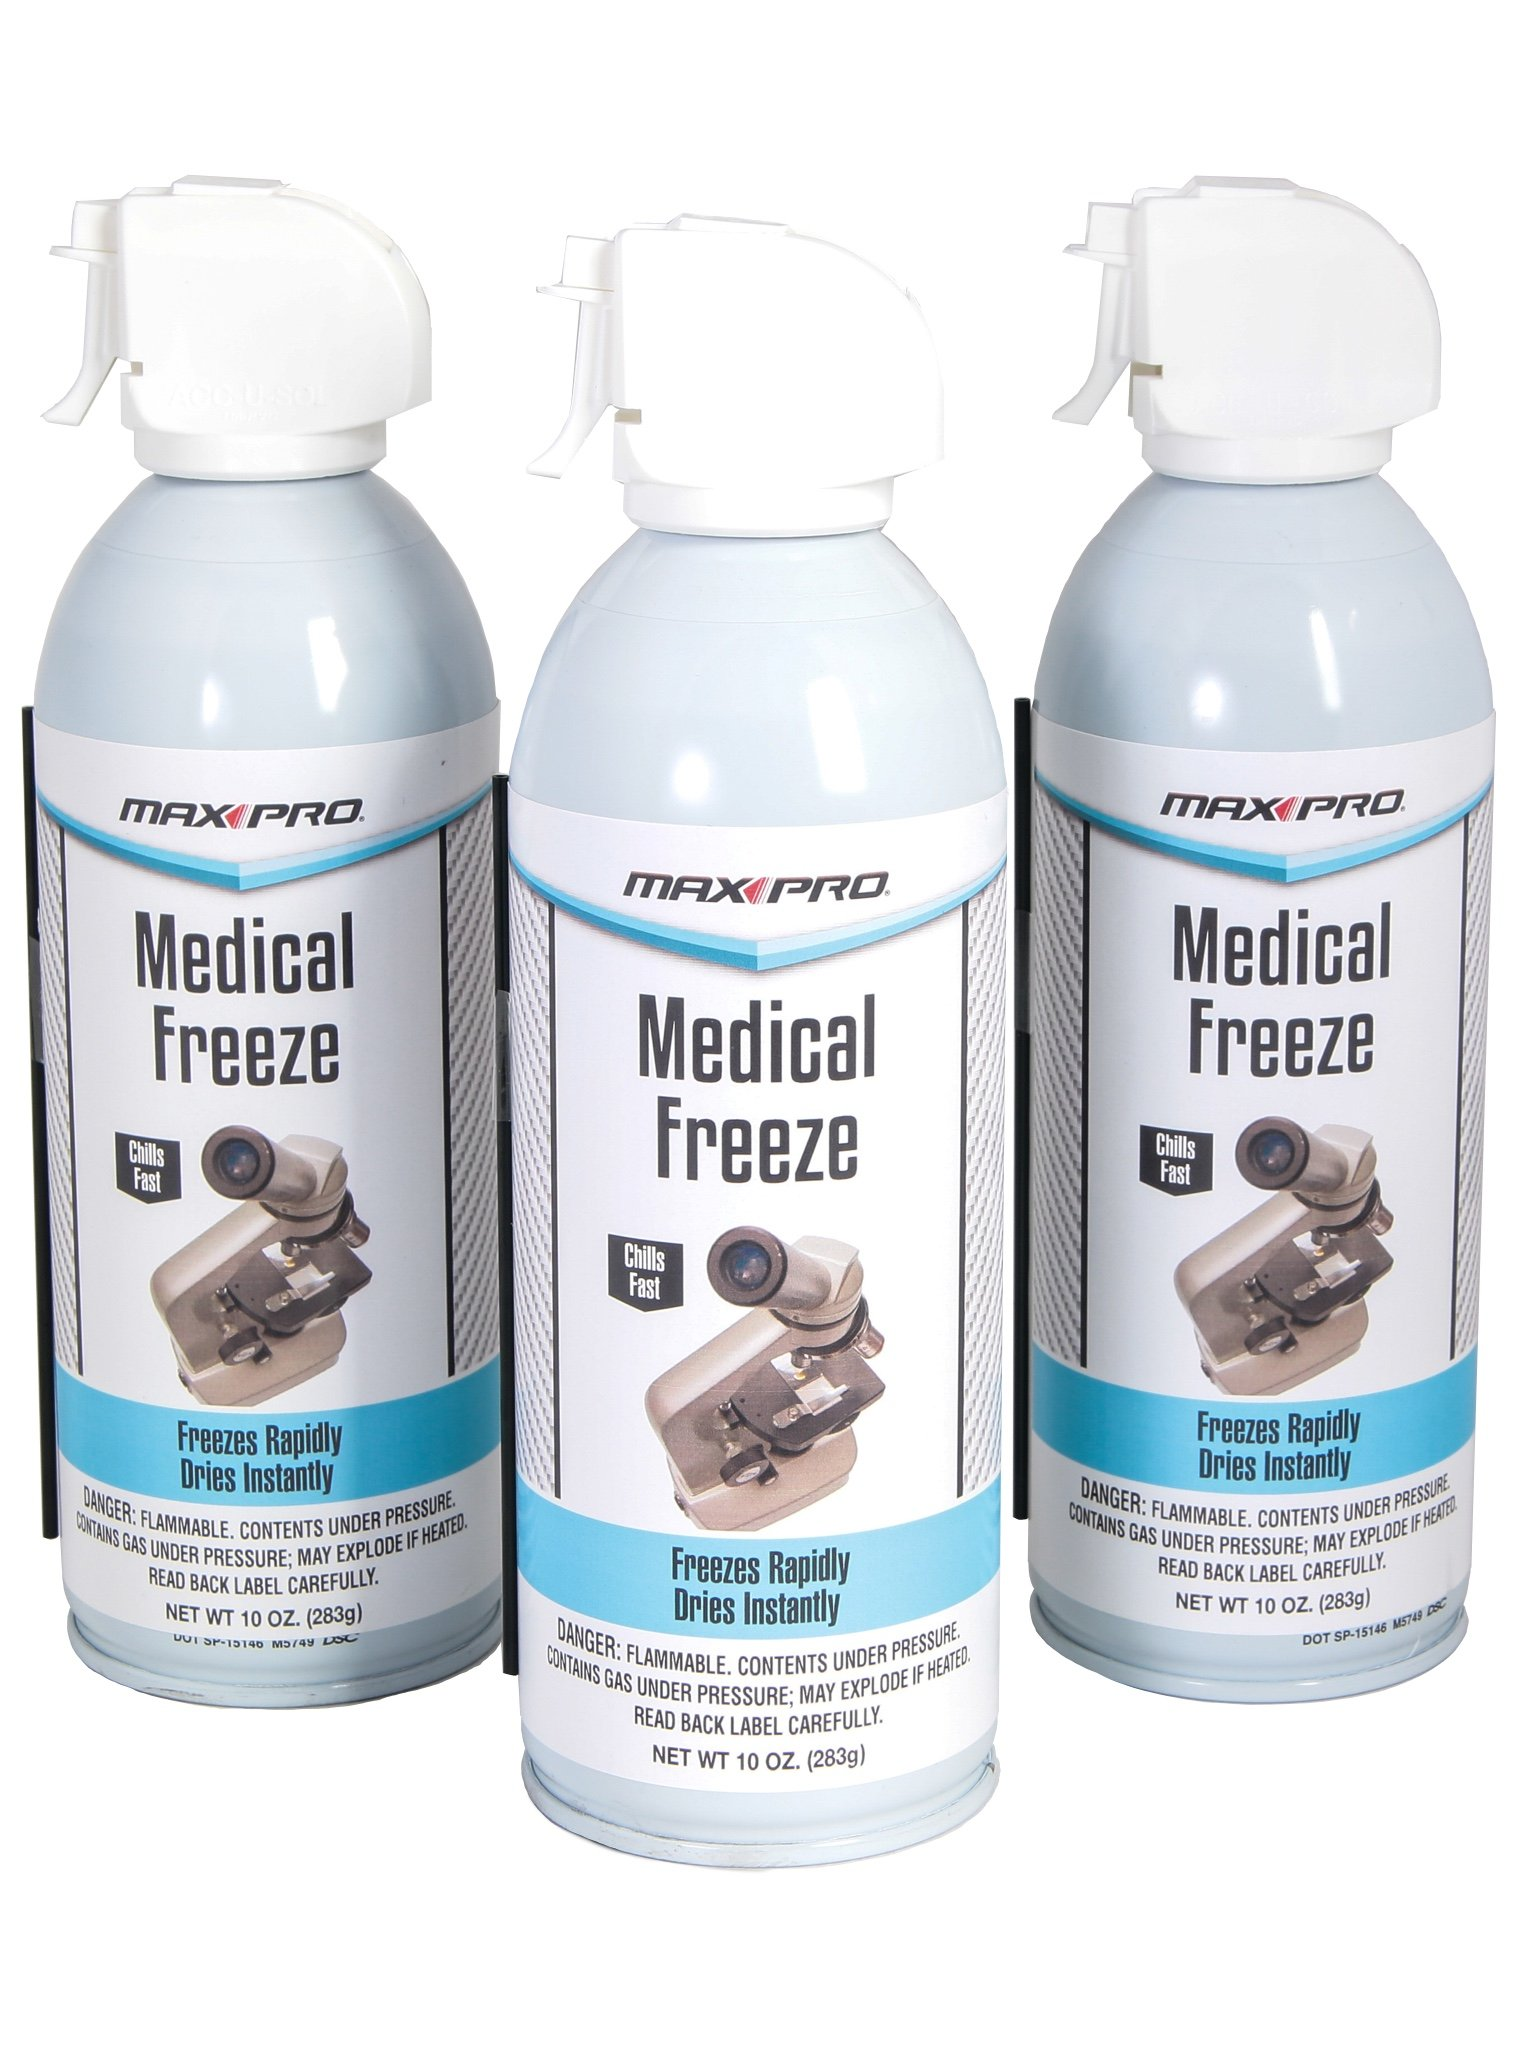 Original Max Pro® Medical Freeze Spray (3) by Promax